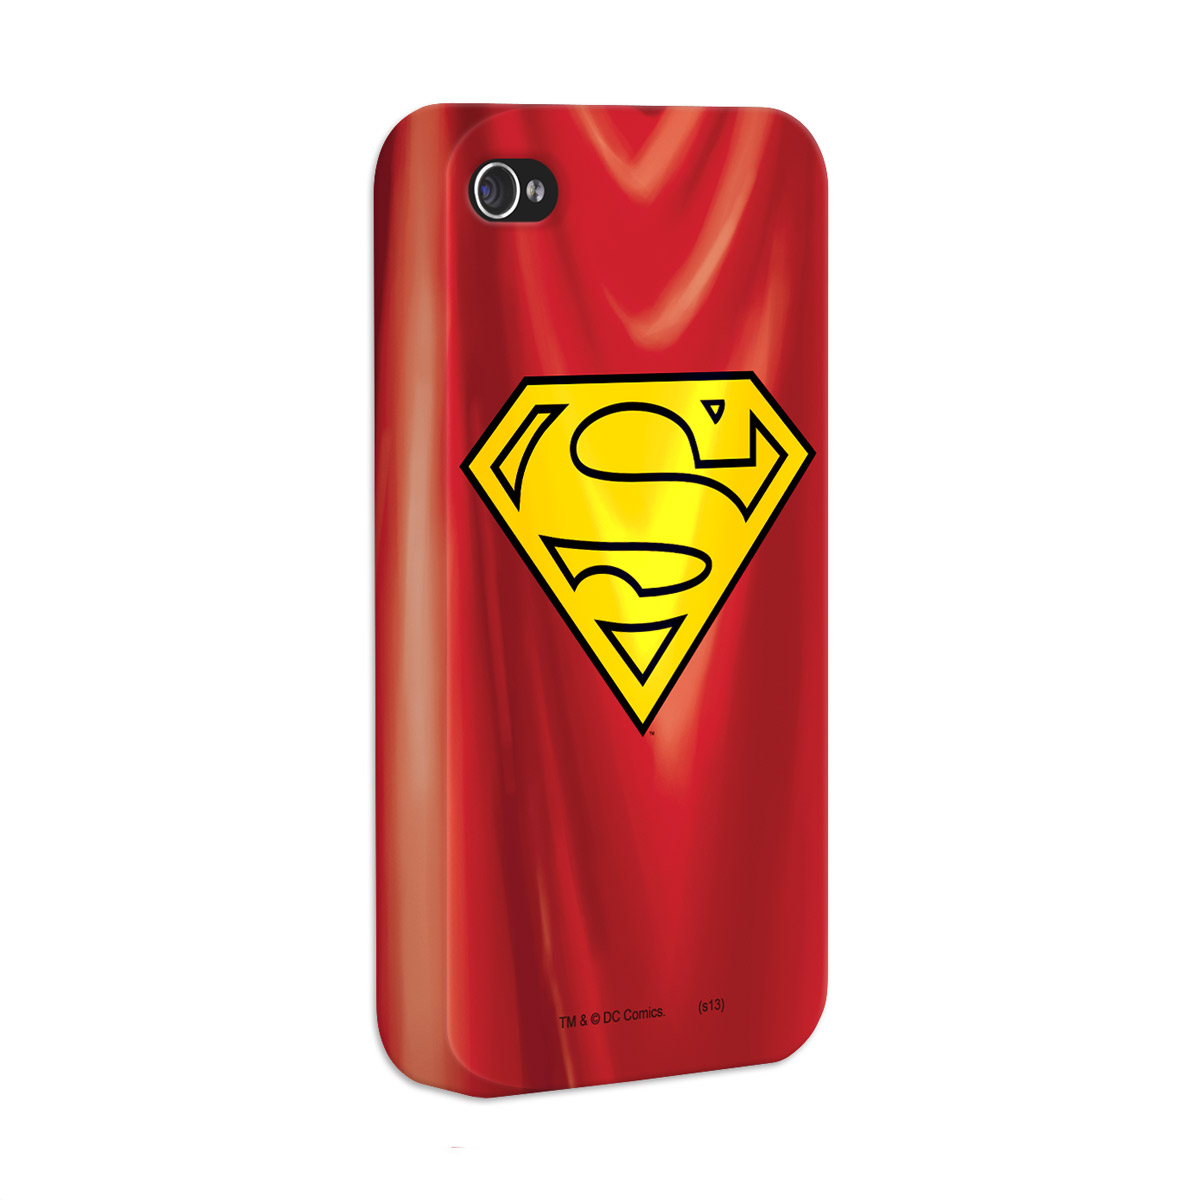 Capa de iPhone 4/4S Superman - Capa